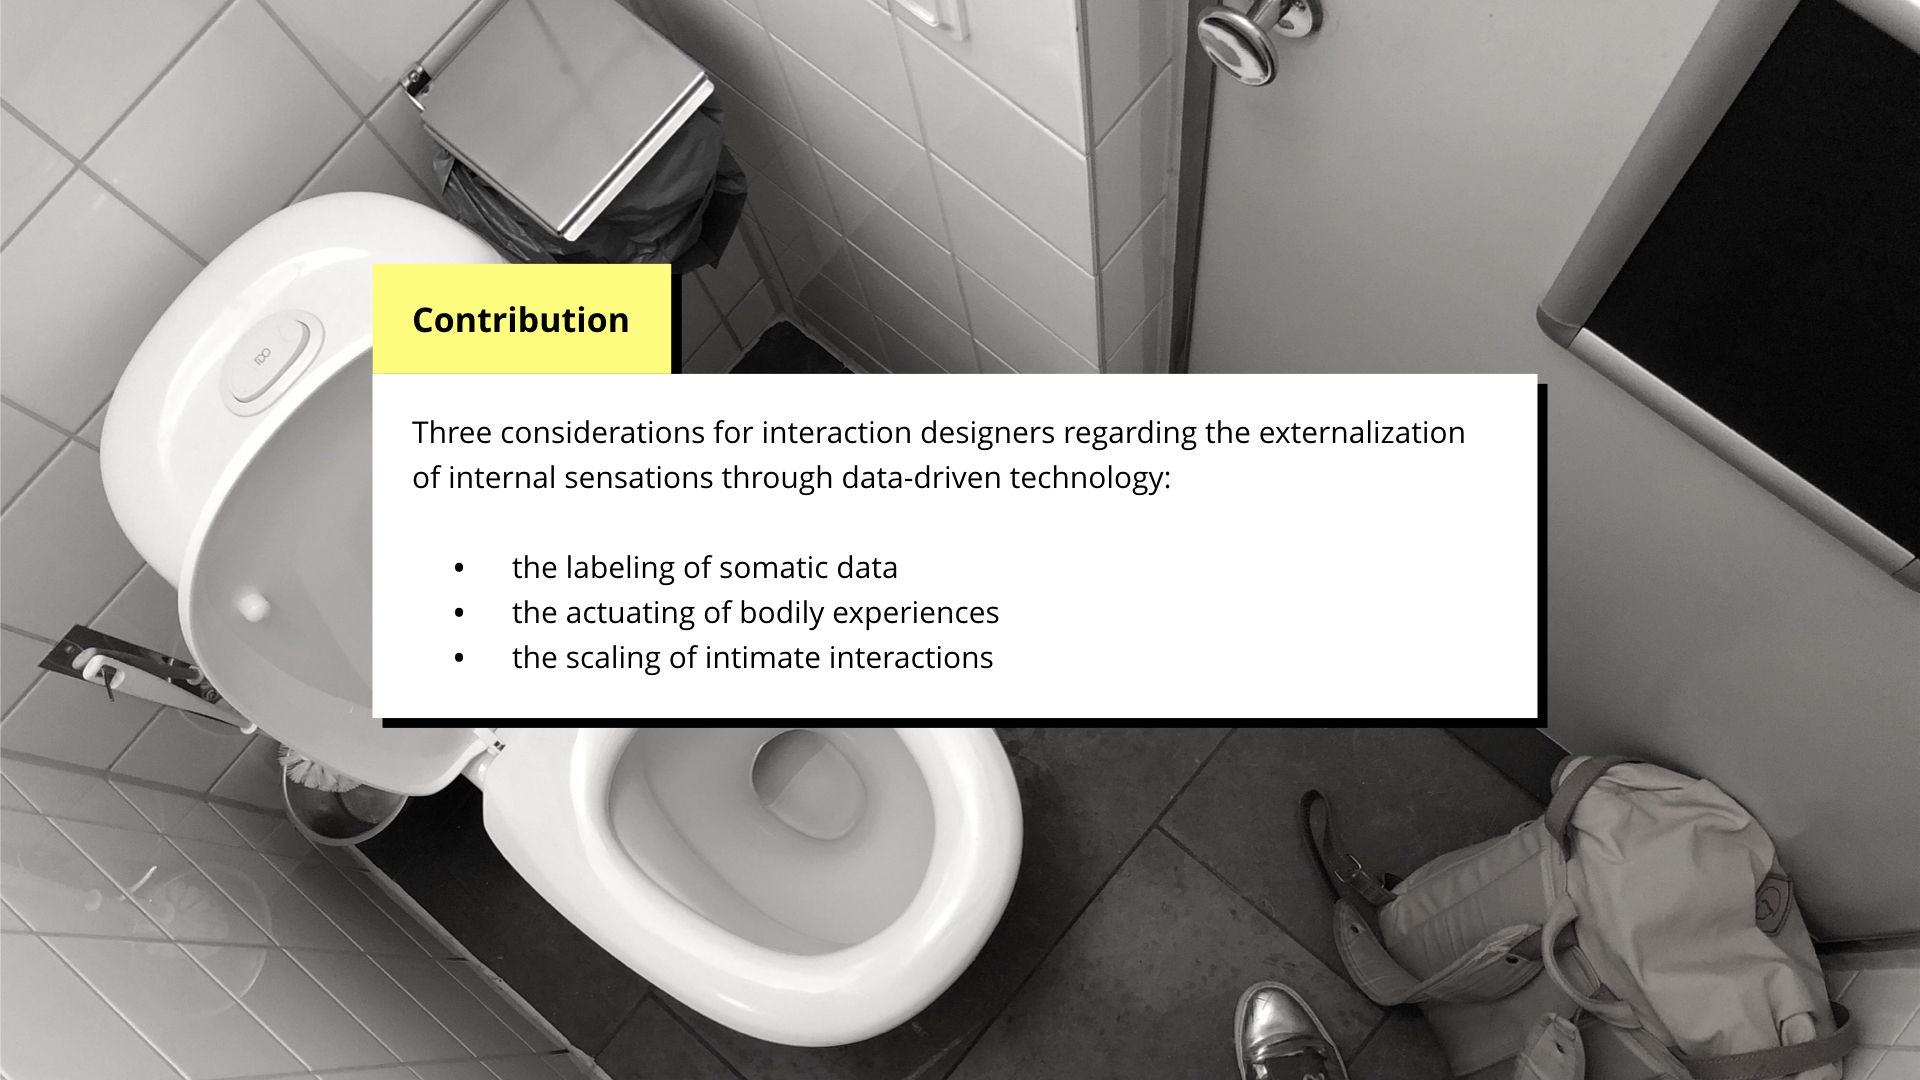 DIS 2019 paper presentation - contribution